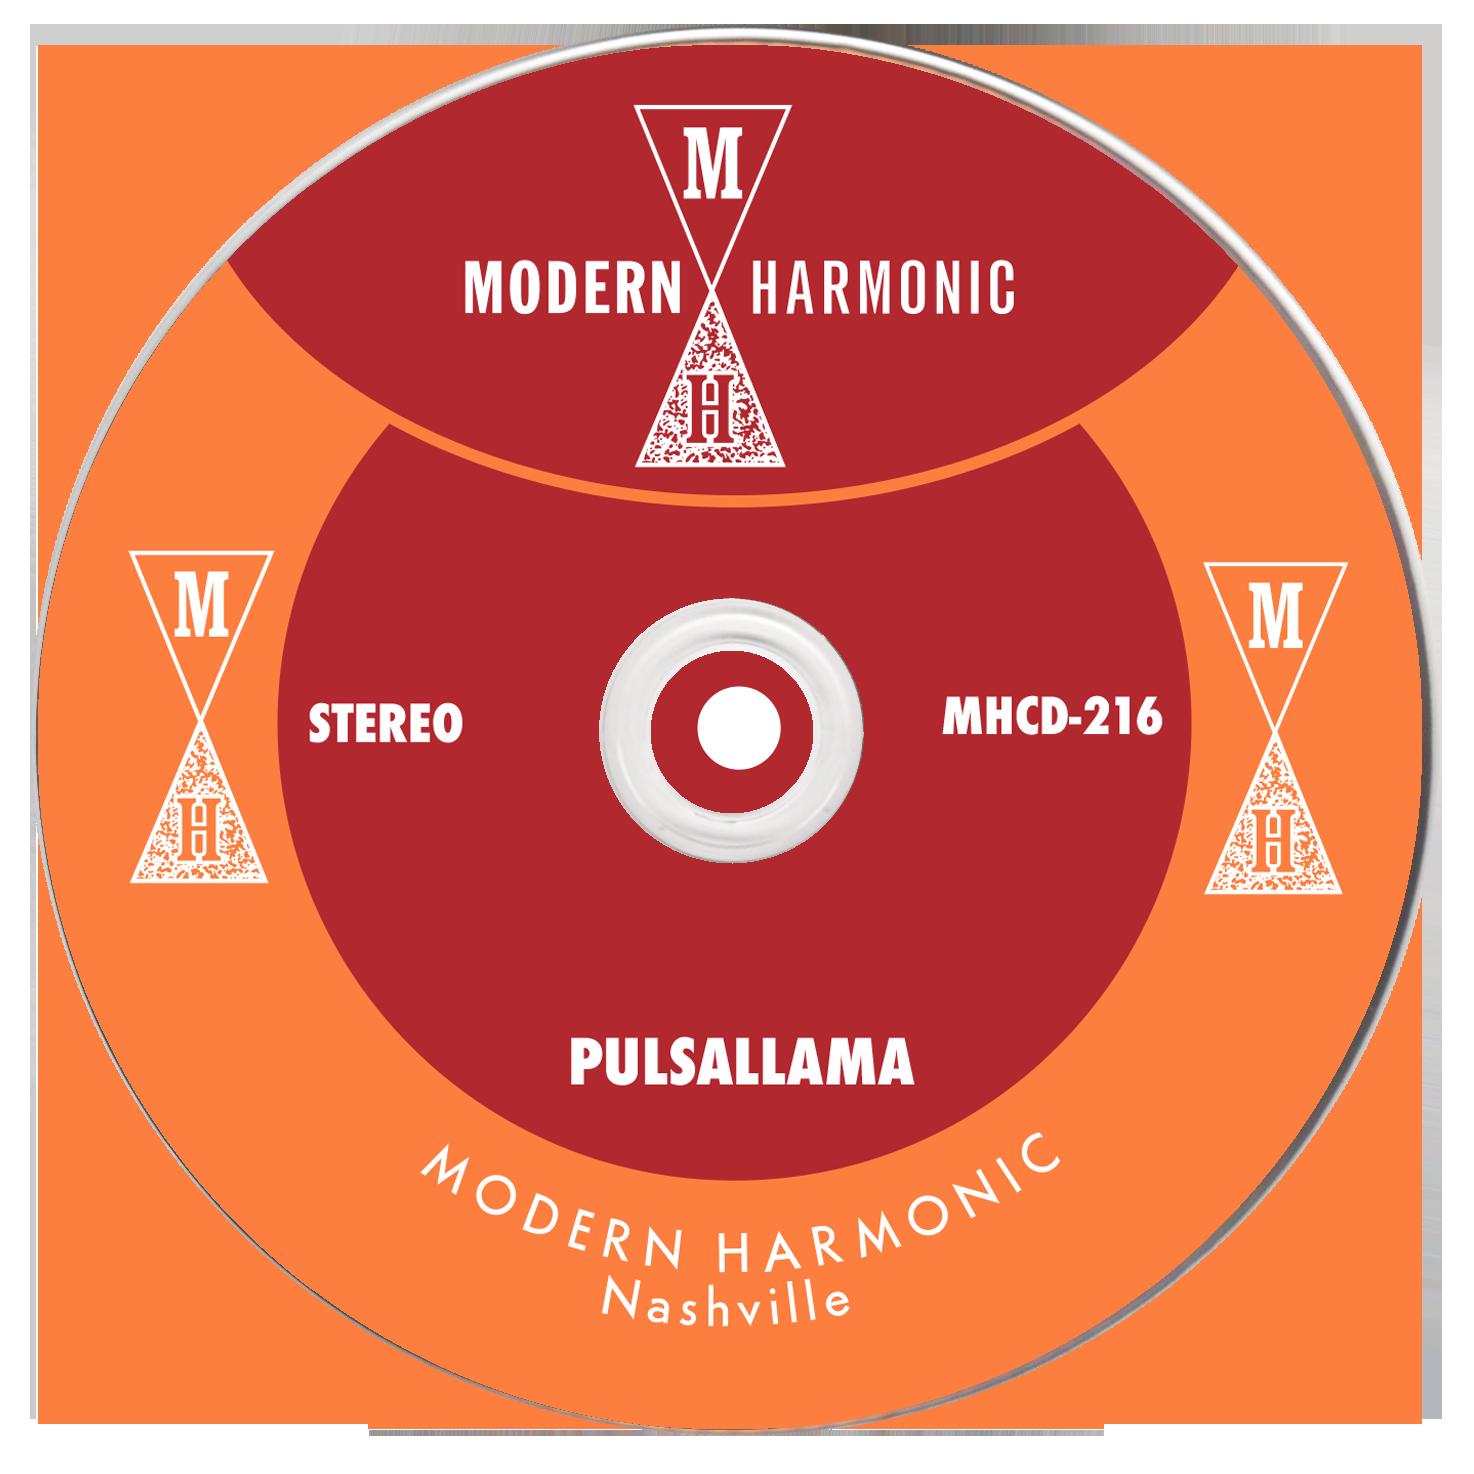 Pulsallama - Pulsallama - CD - CD-MHCD-216